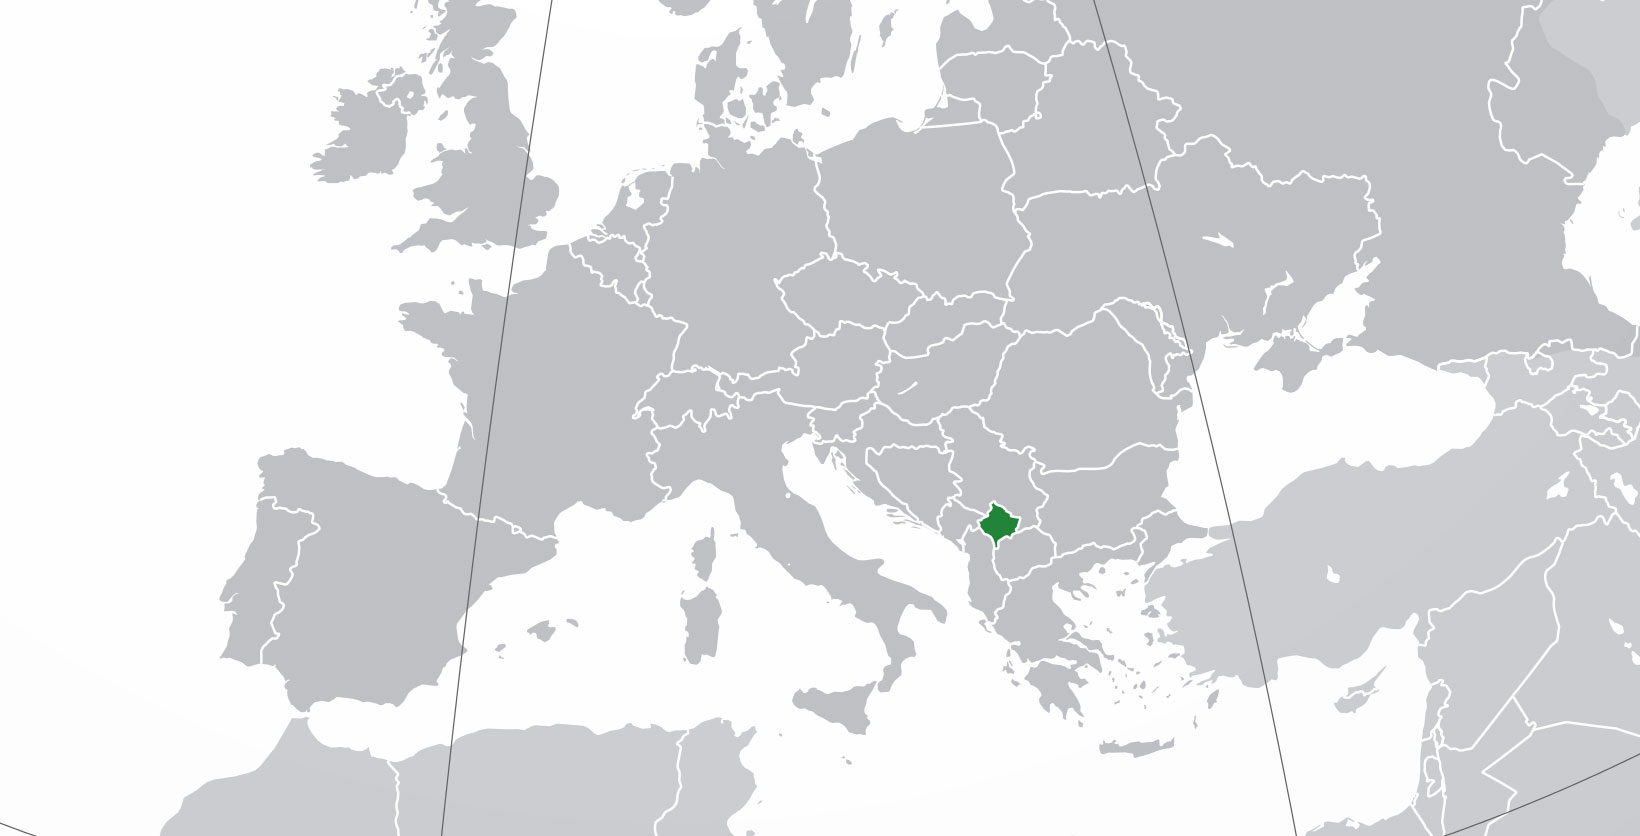 Kosovo mapa geogr fico for Marmol donde se encuentra